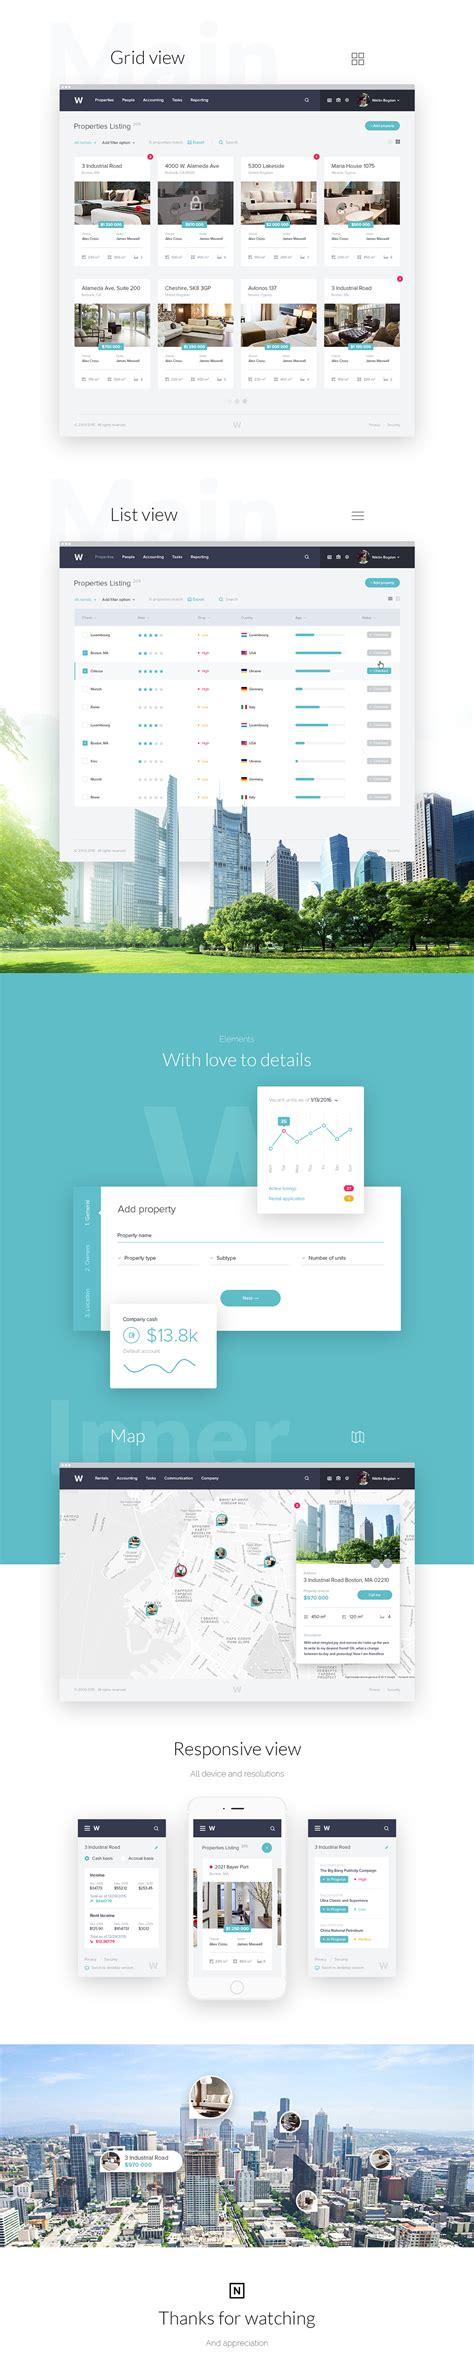 real estate website design on pantone canvas gallery